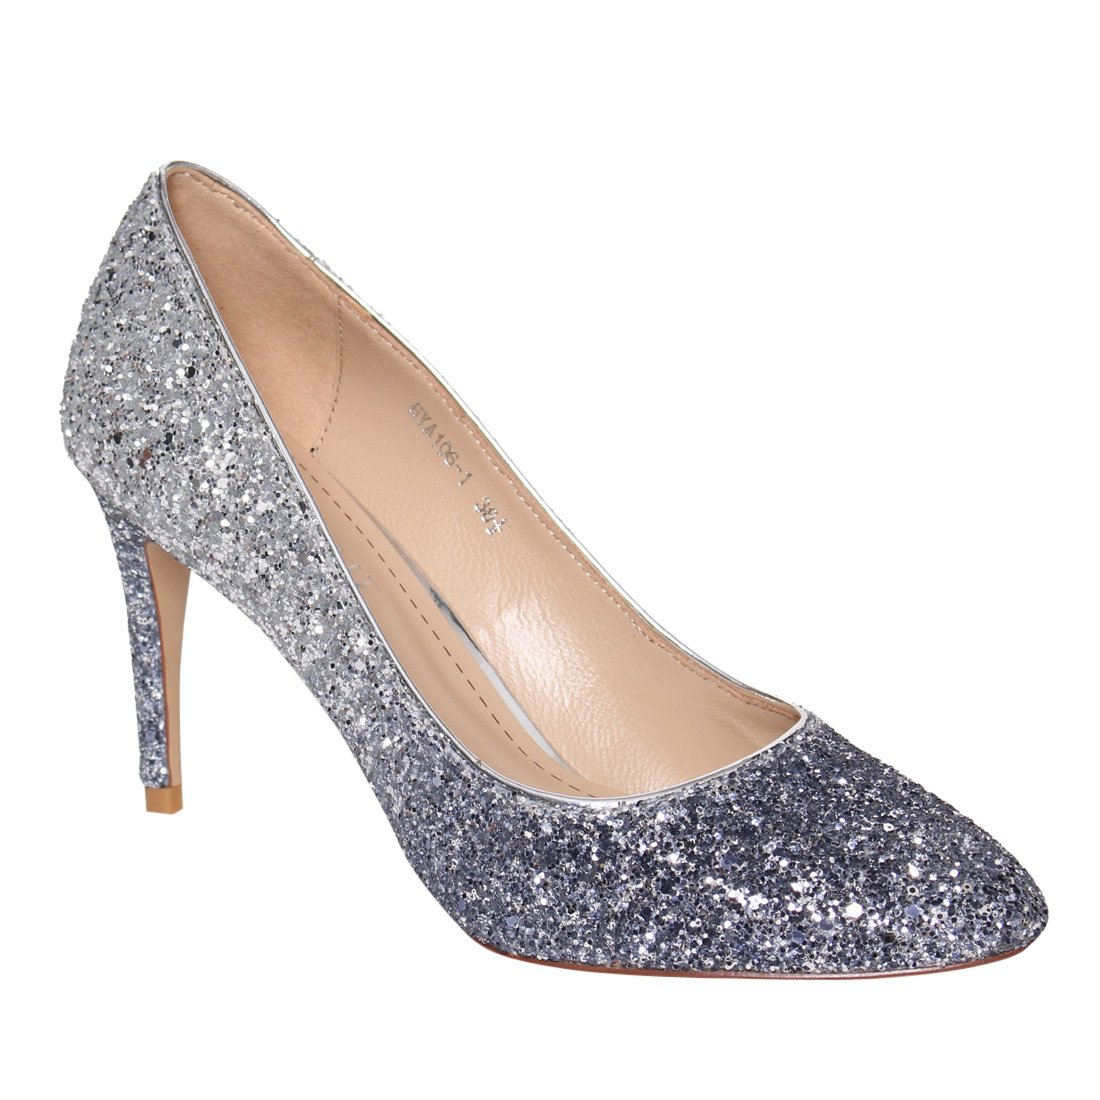 LANINI DE60 Women's Coarse Glitter Leather Stiletto Evening Dress Pumps Shoes, Color:GRADIENT GLITTER, Size:38 EU/ 8 B(M) US